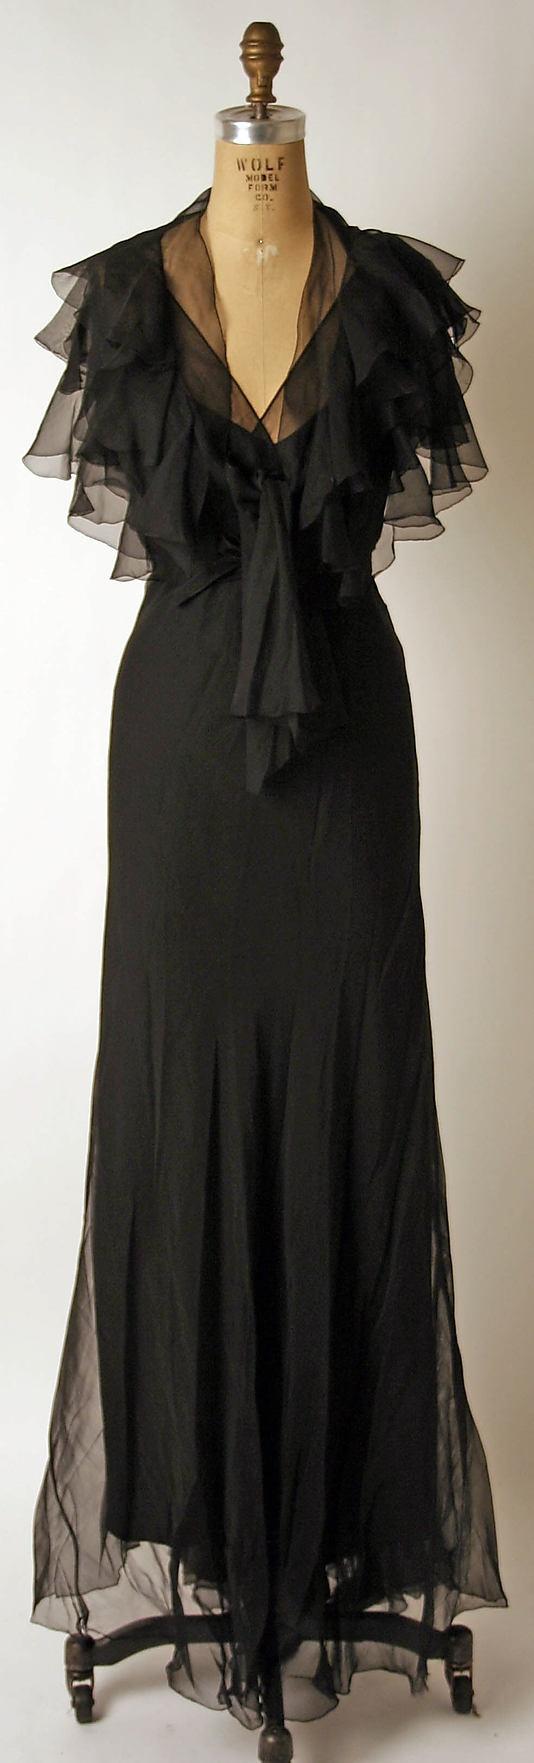 Dress, Nettie Rosenstein, 1930s, American, silk via Metropolitan Museum of Art